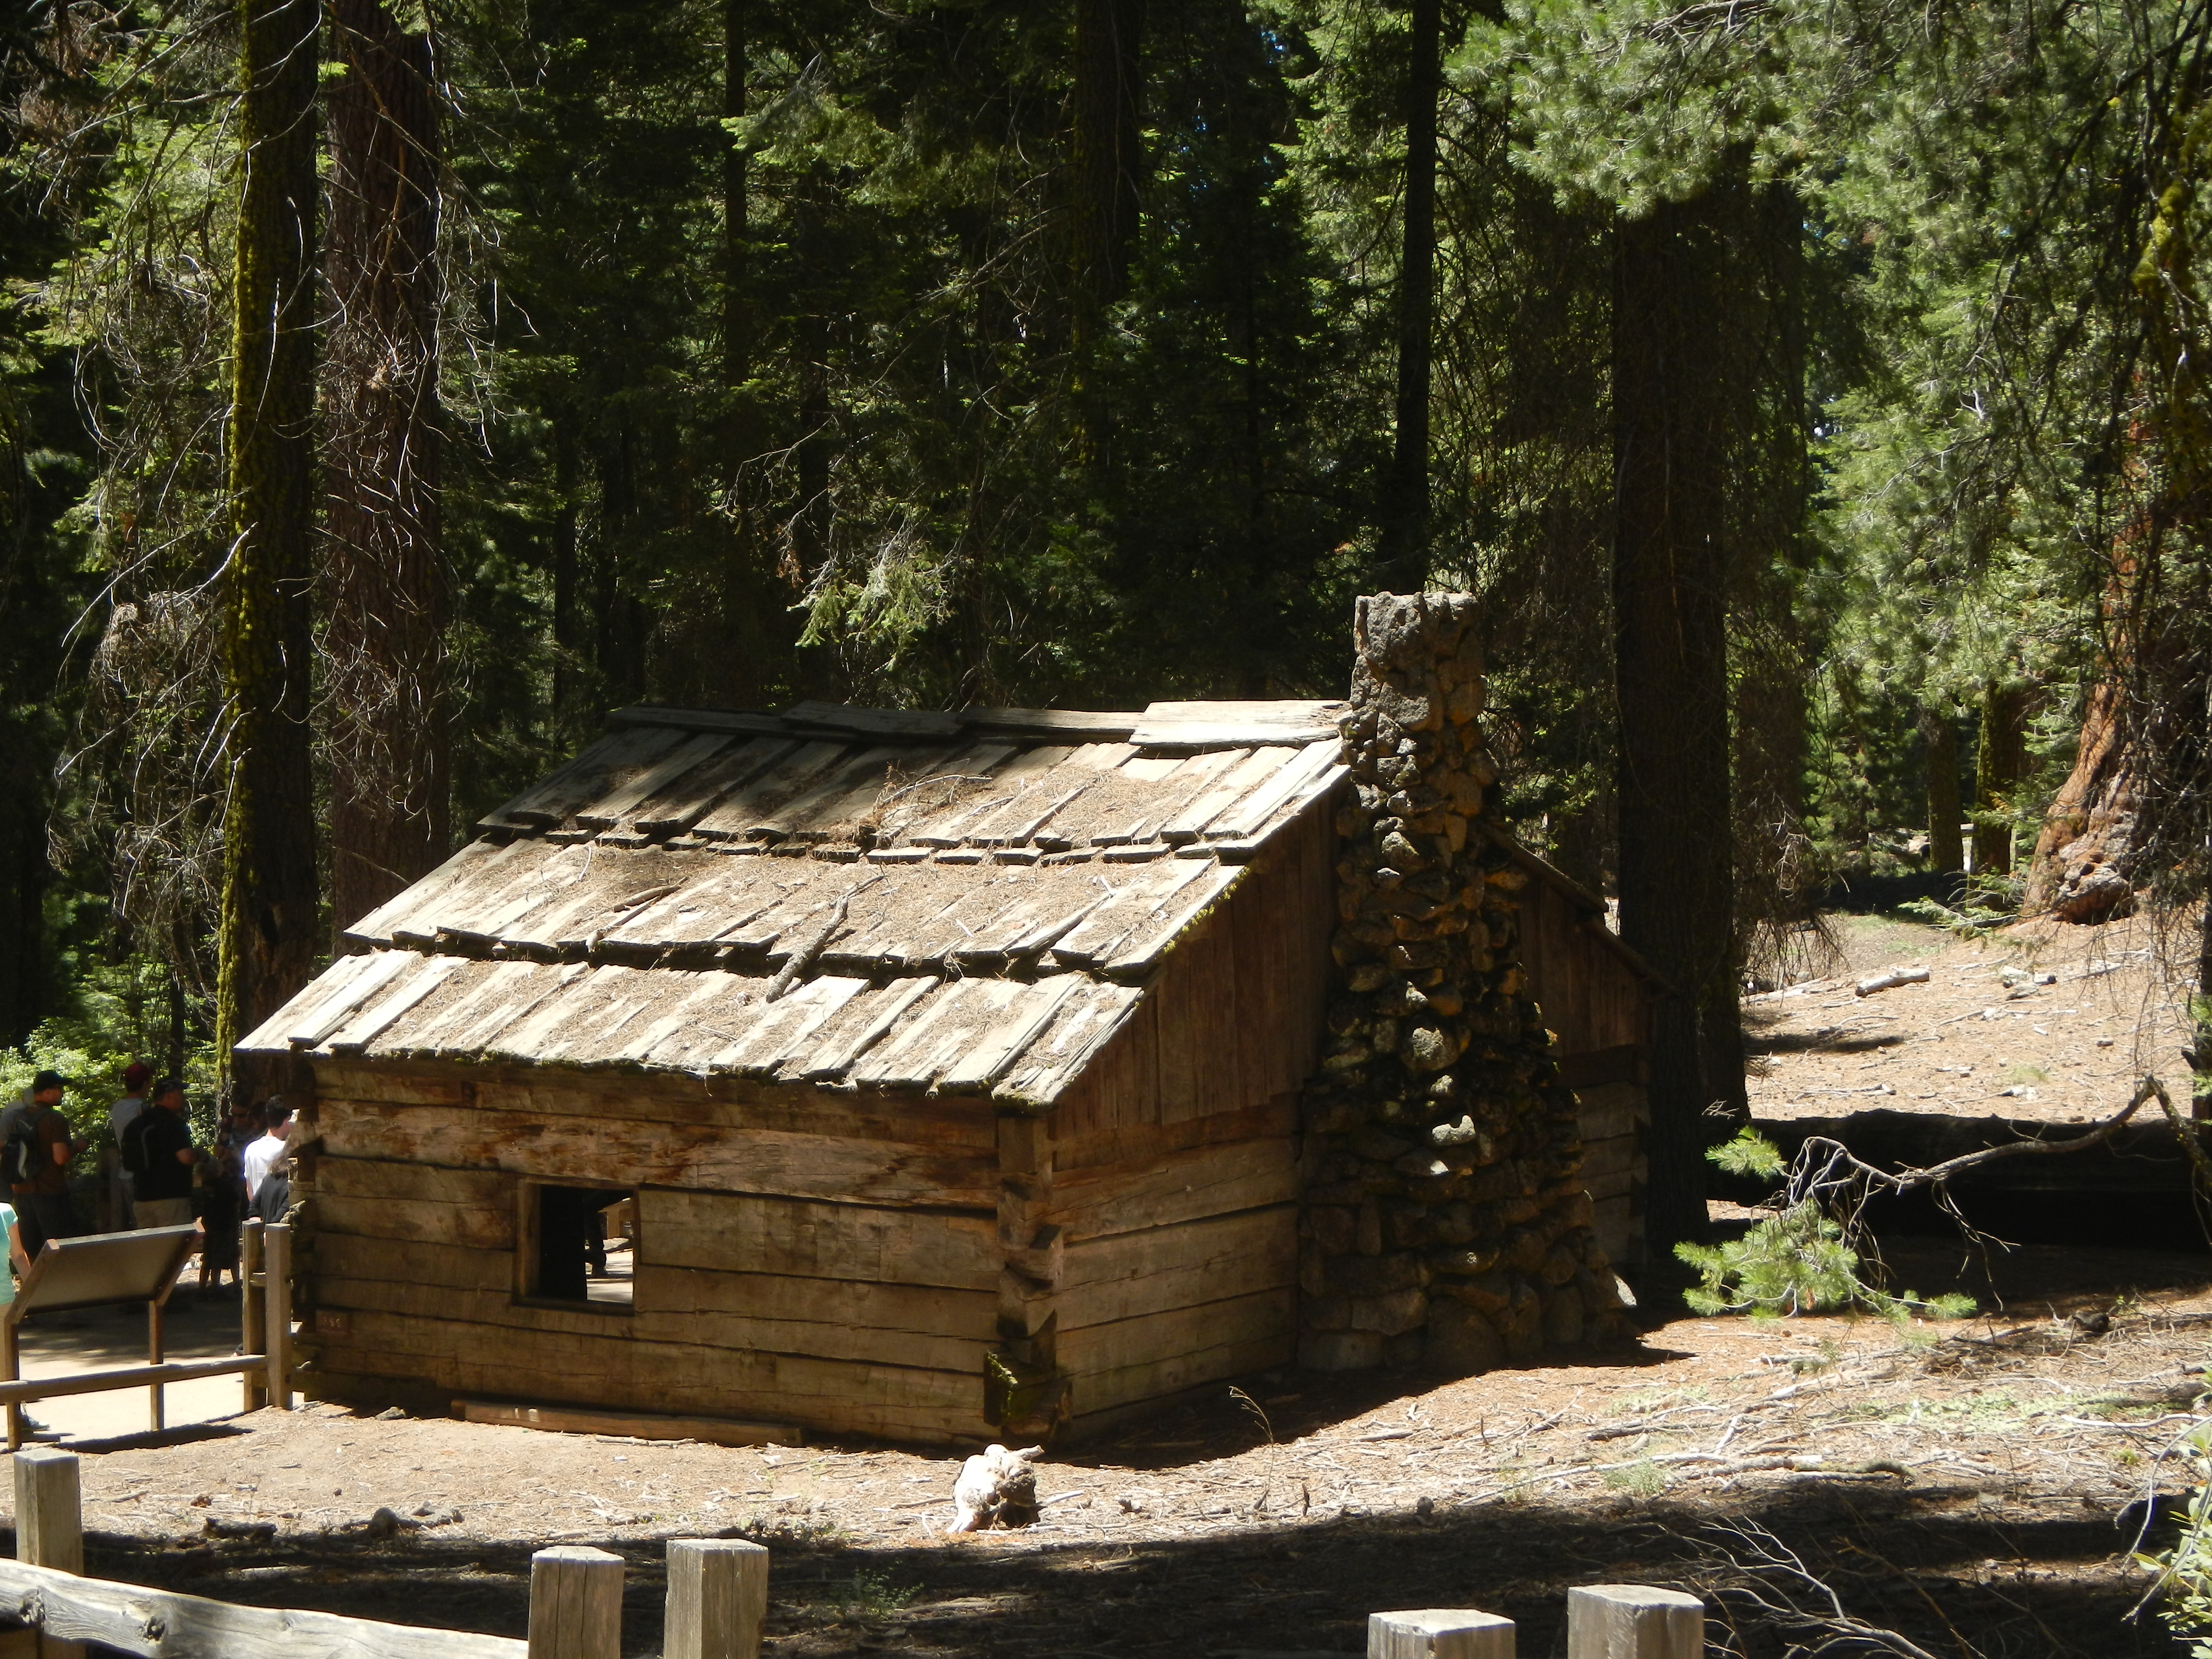 redwoods cabins yosemite in america california sequoia national just the park